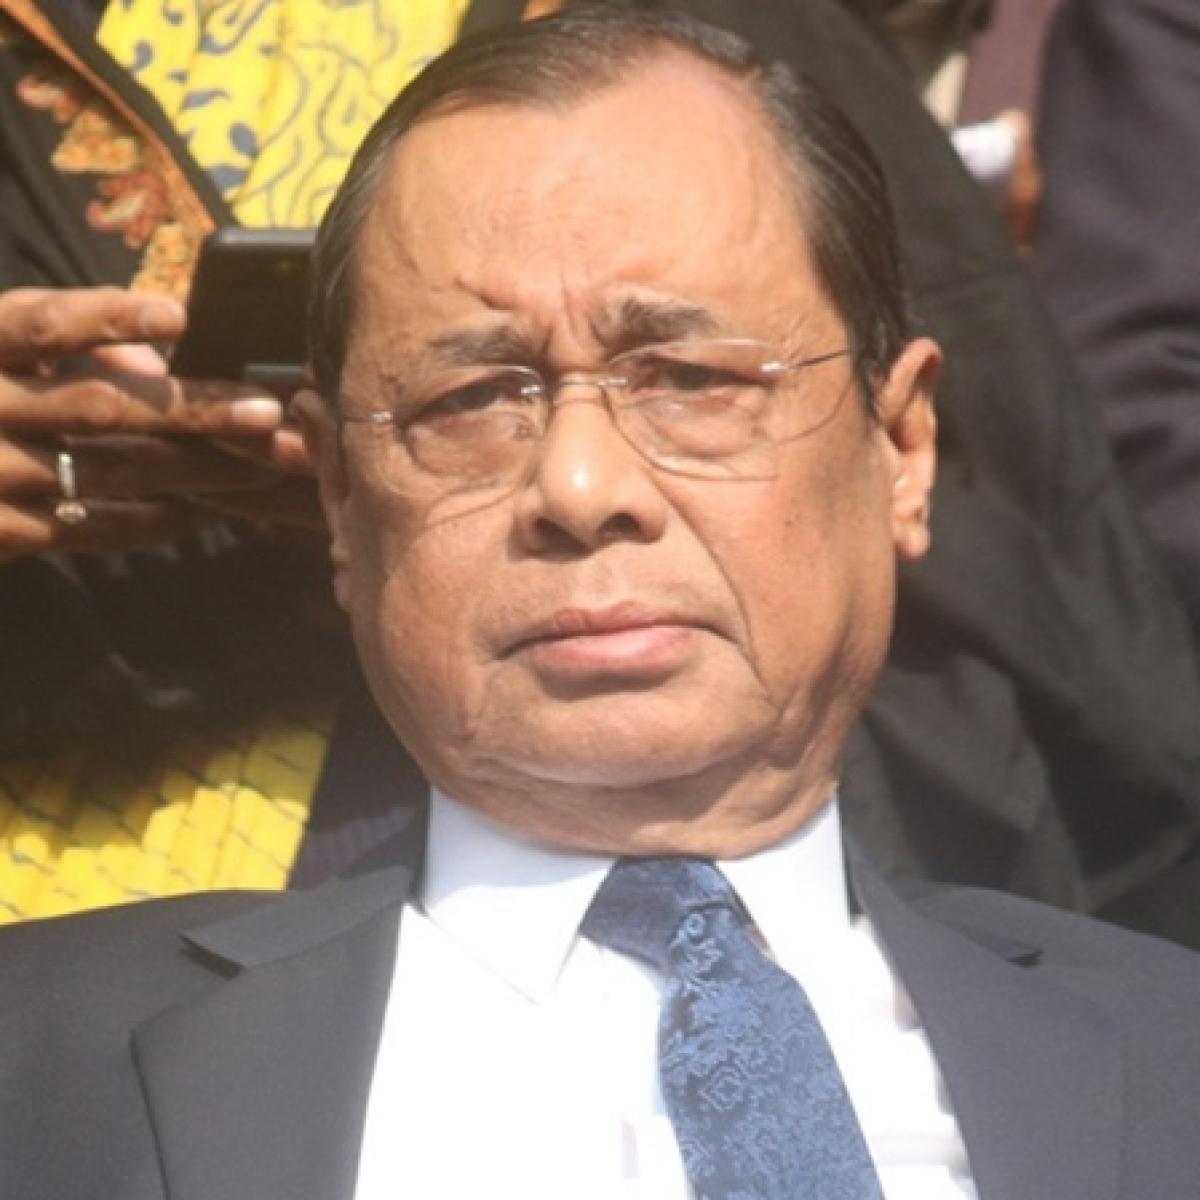 Outgoing CJI Gogoi declines requests for press interviews